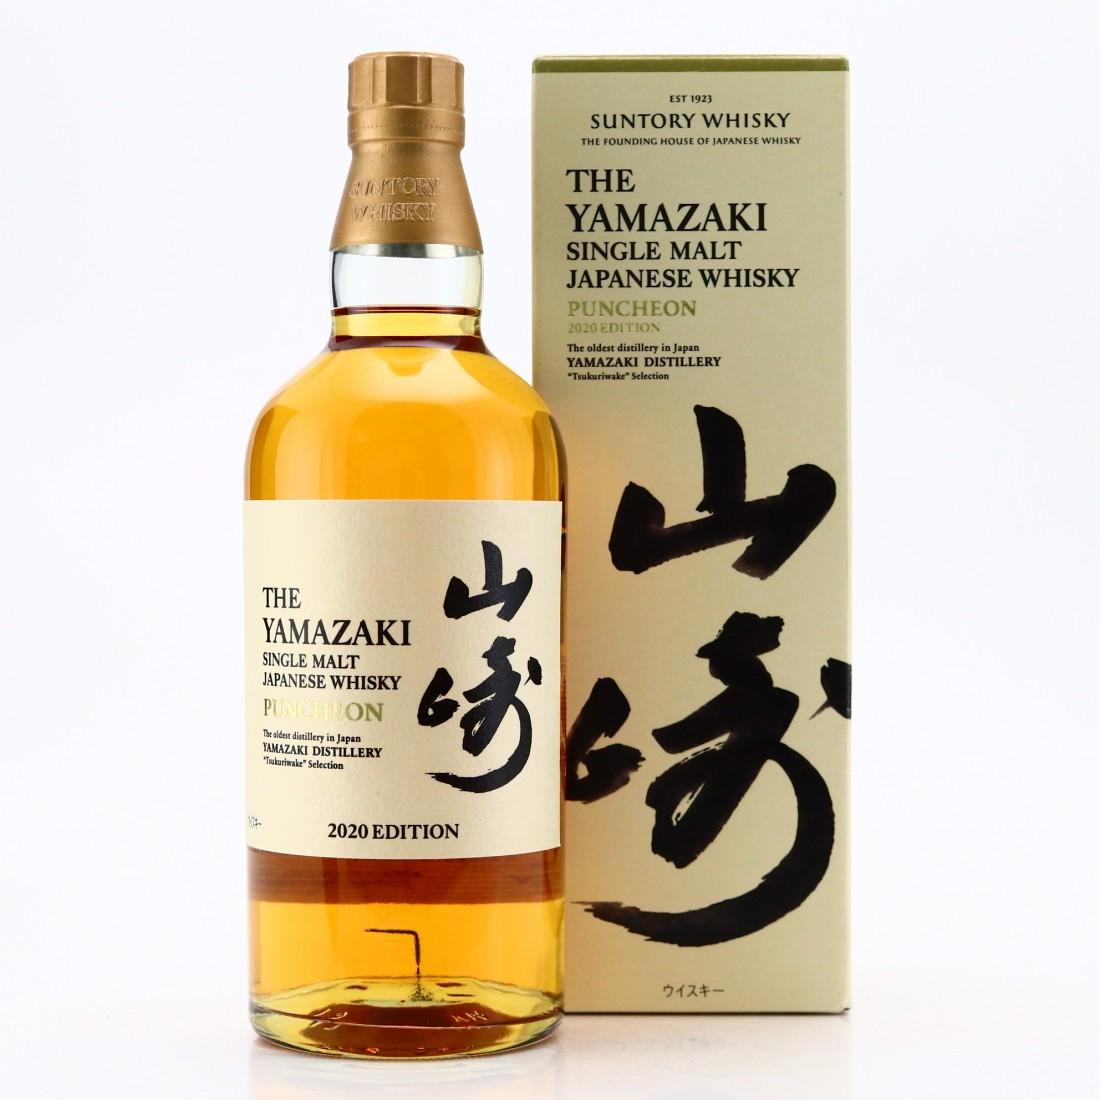 Yamazaki Puncheon 2020 Edition